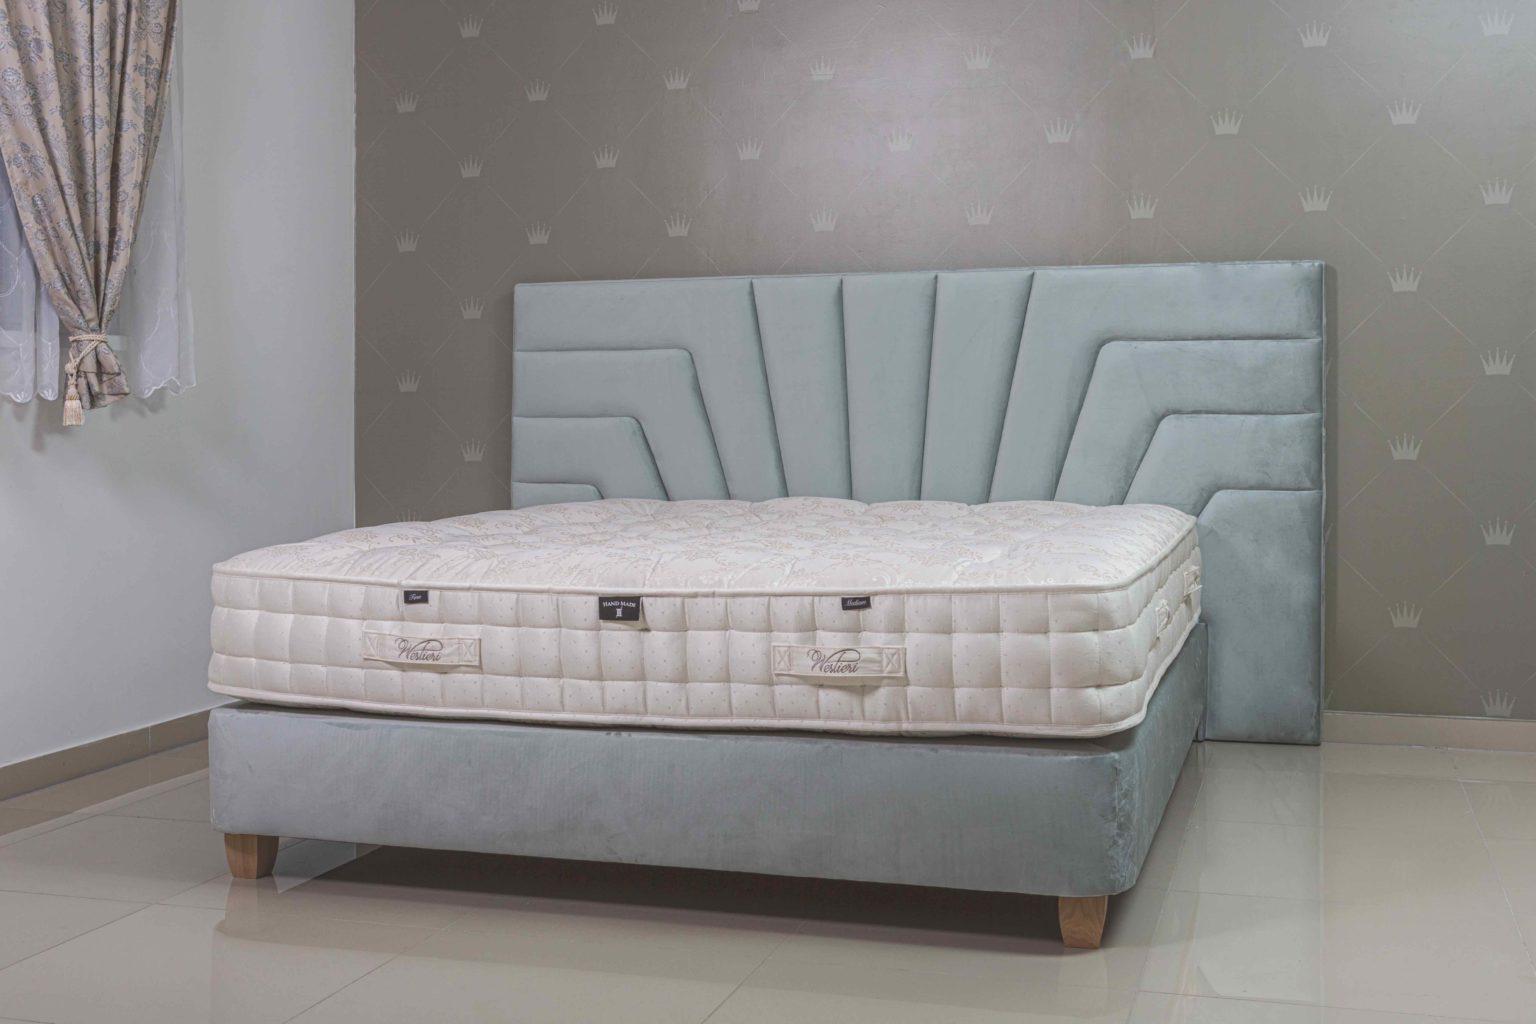 dizajnove postele na mieru Westieri